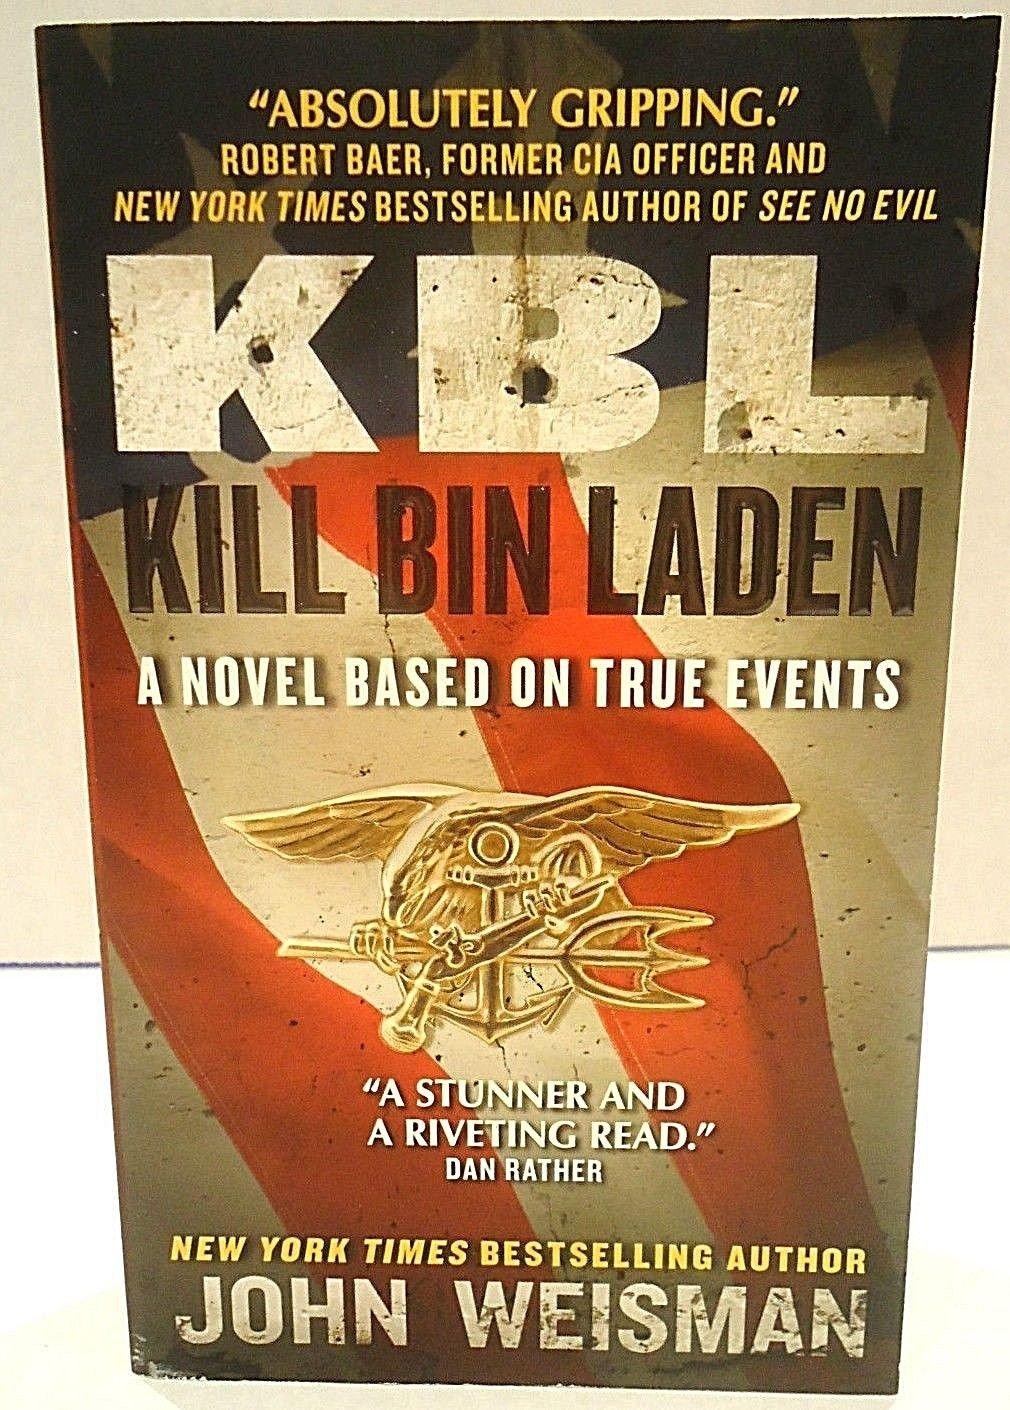 KBL: KILL BIN LADEN - JOHN WEISMAN - NAVY SEALS + FREE BONUS - BOOK LIGHT - NEW